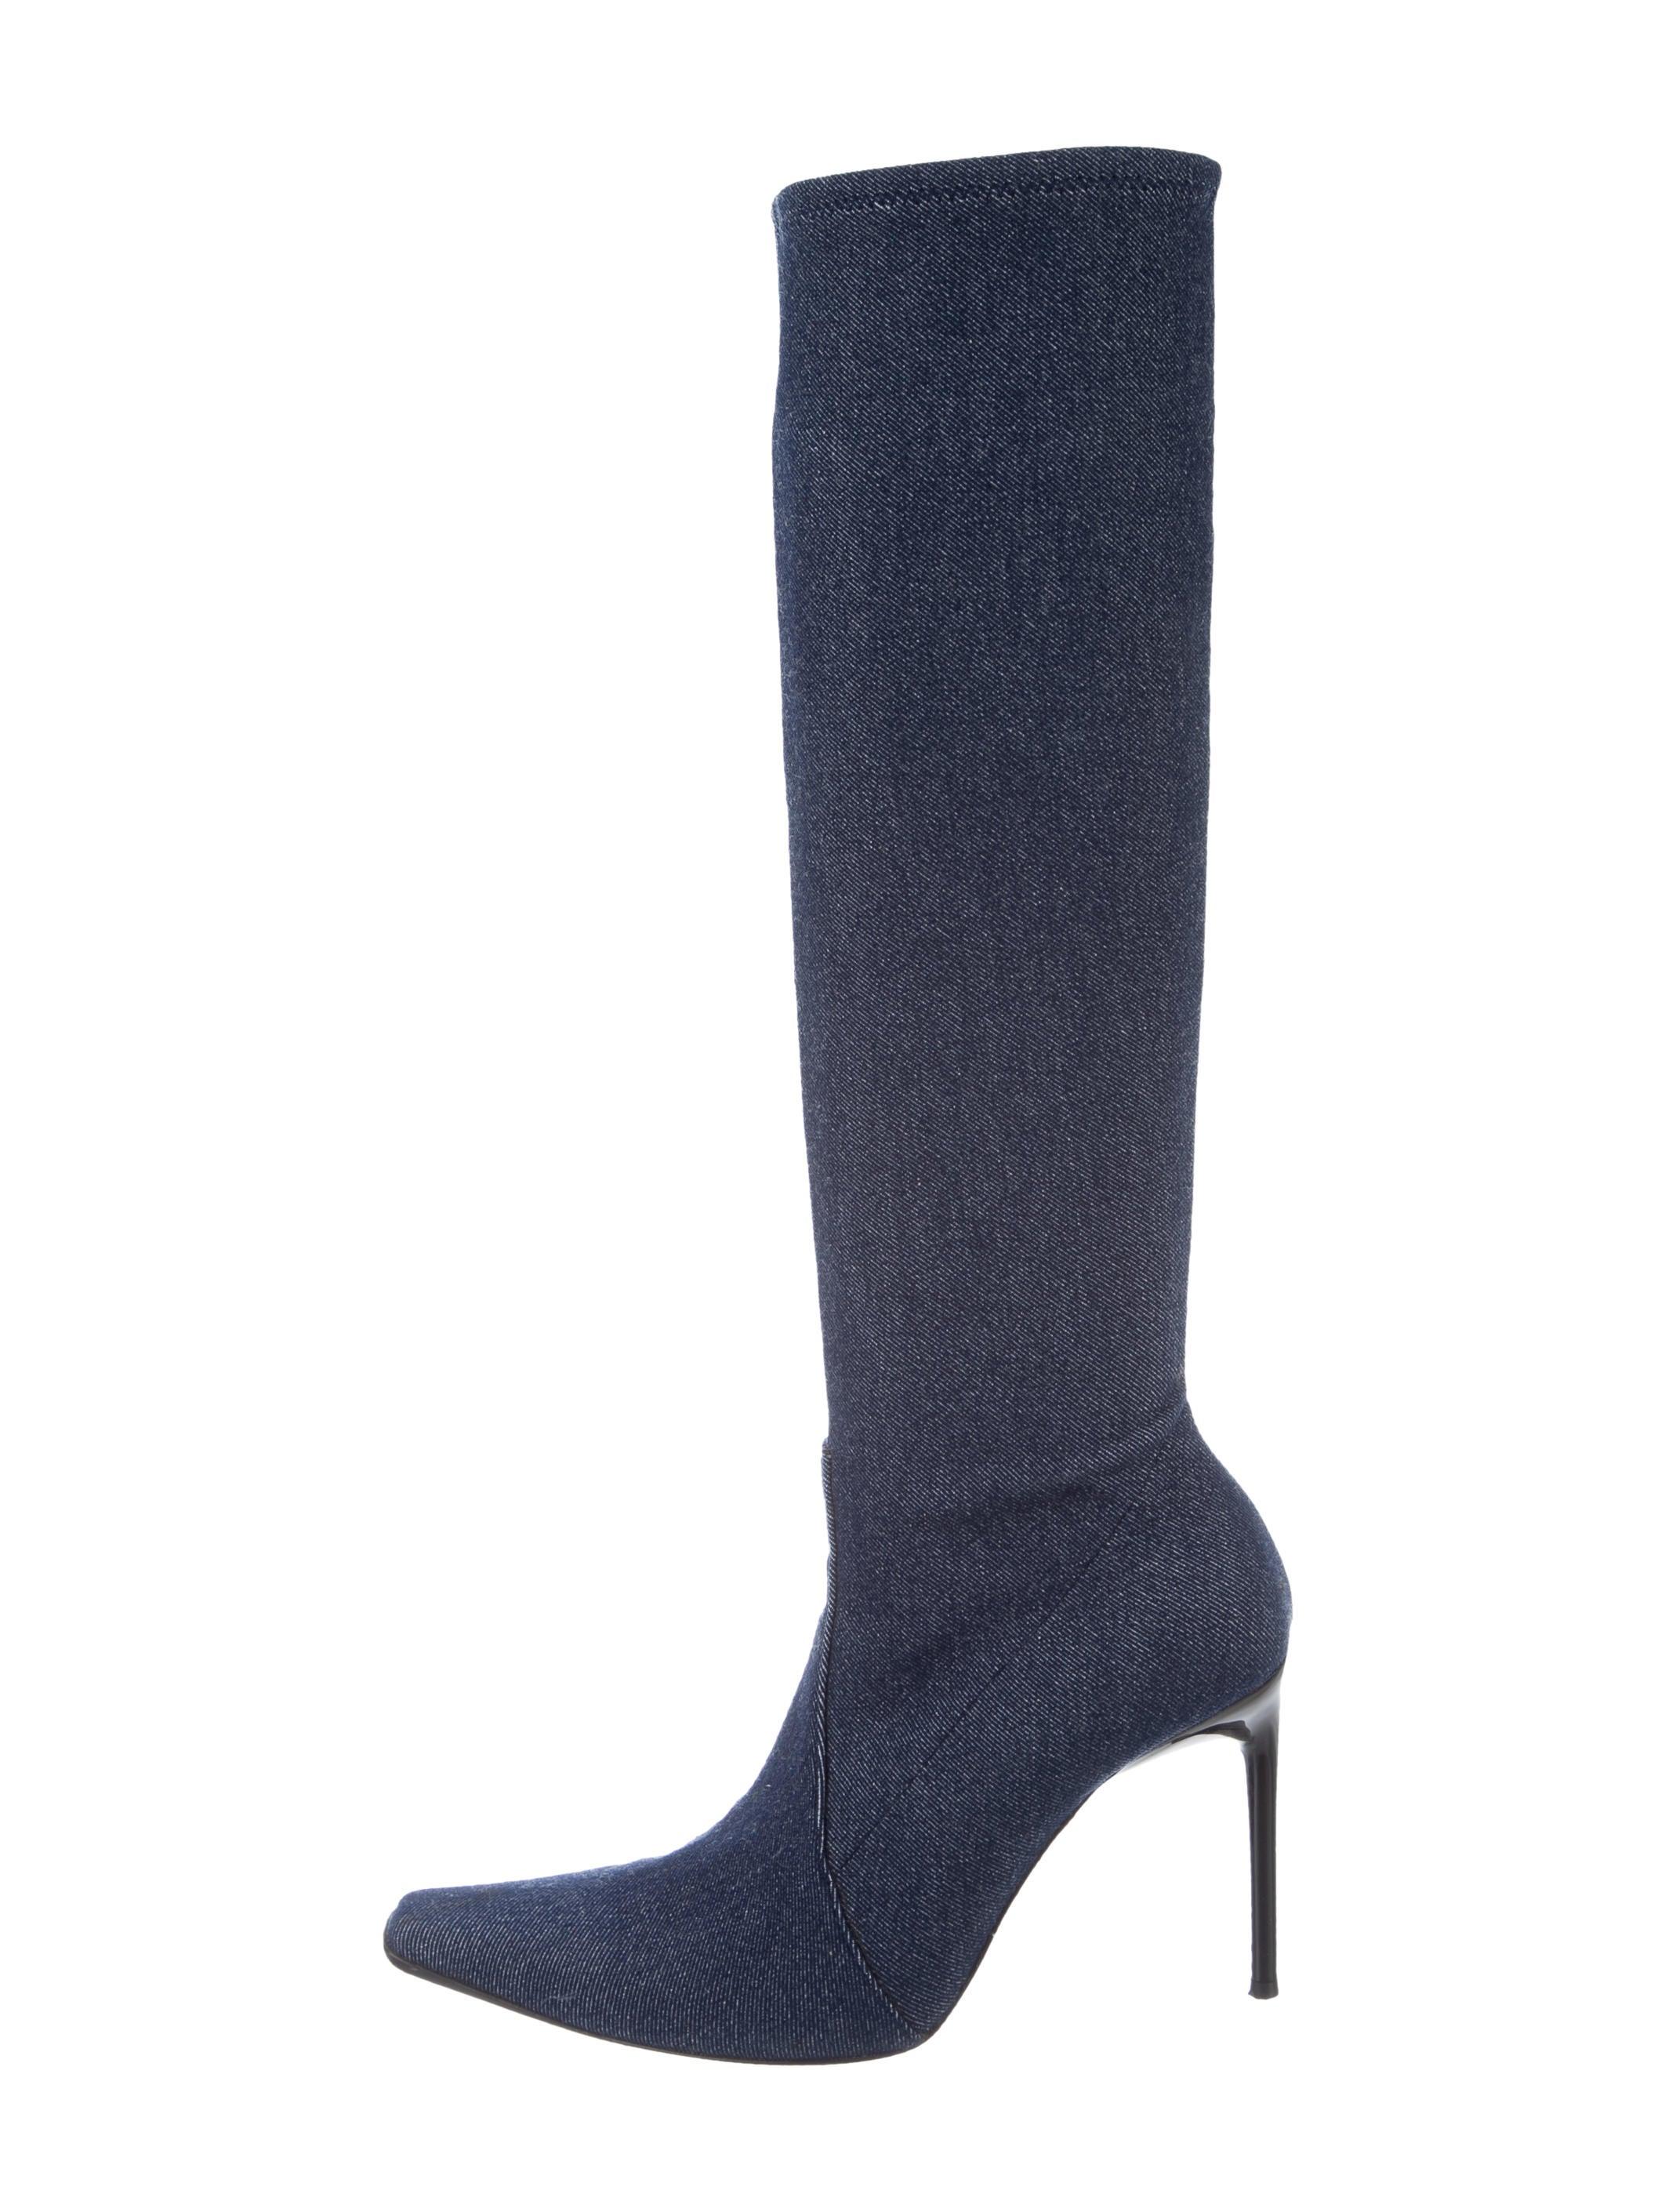 casadei denim knee high boots shoes cei22853 the